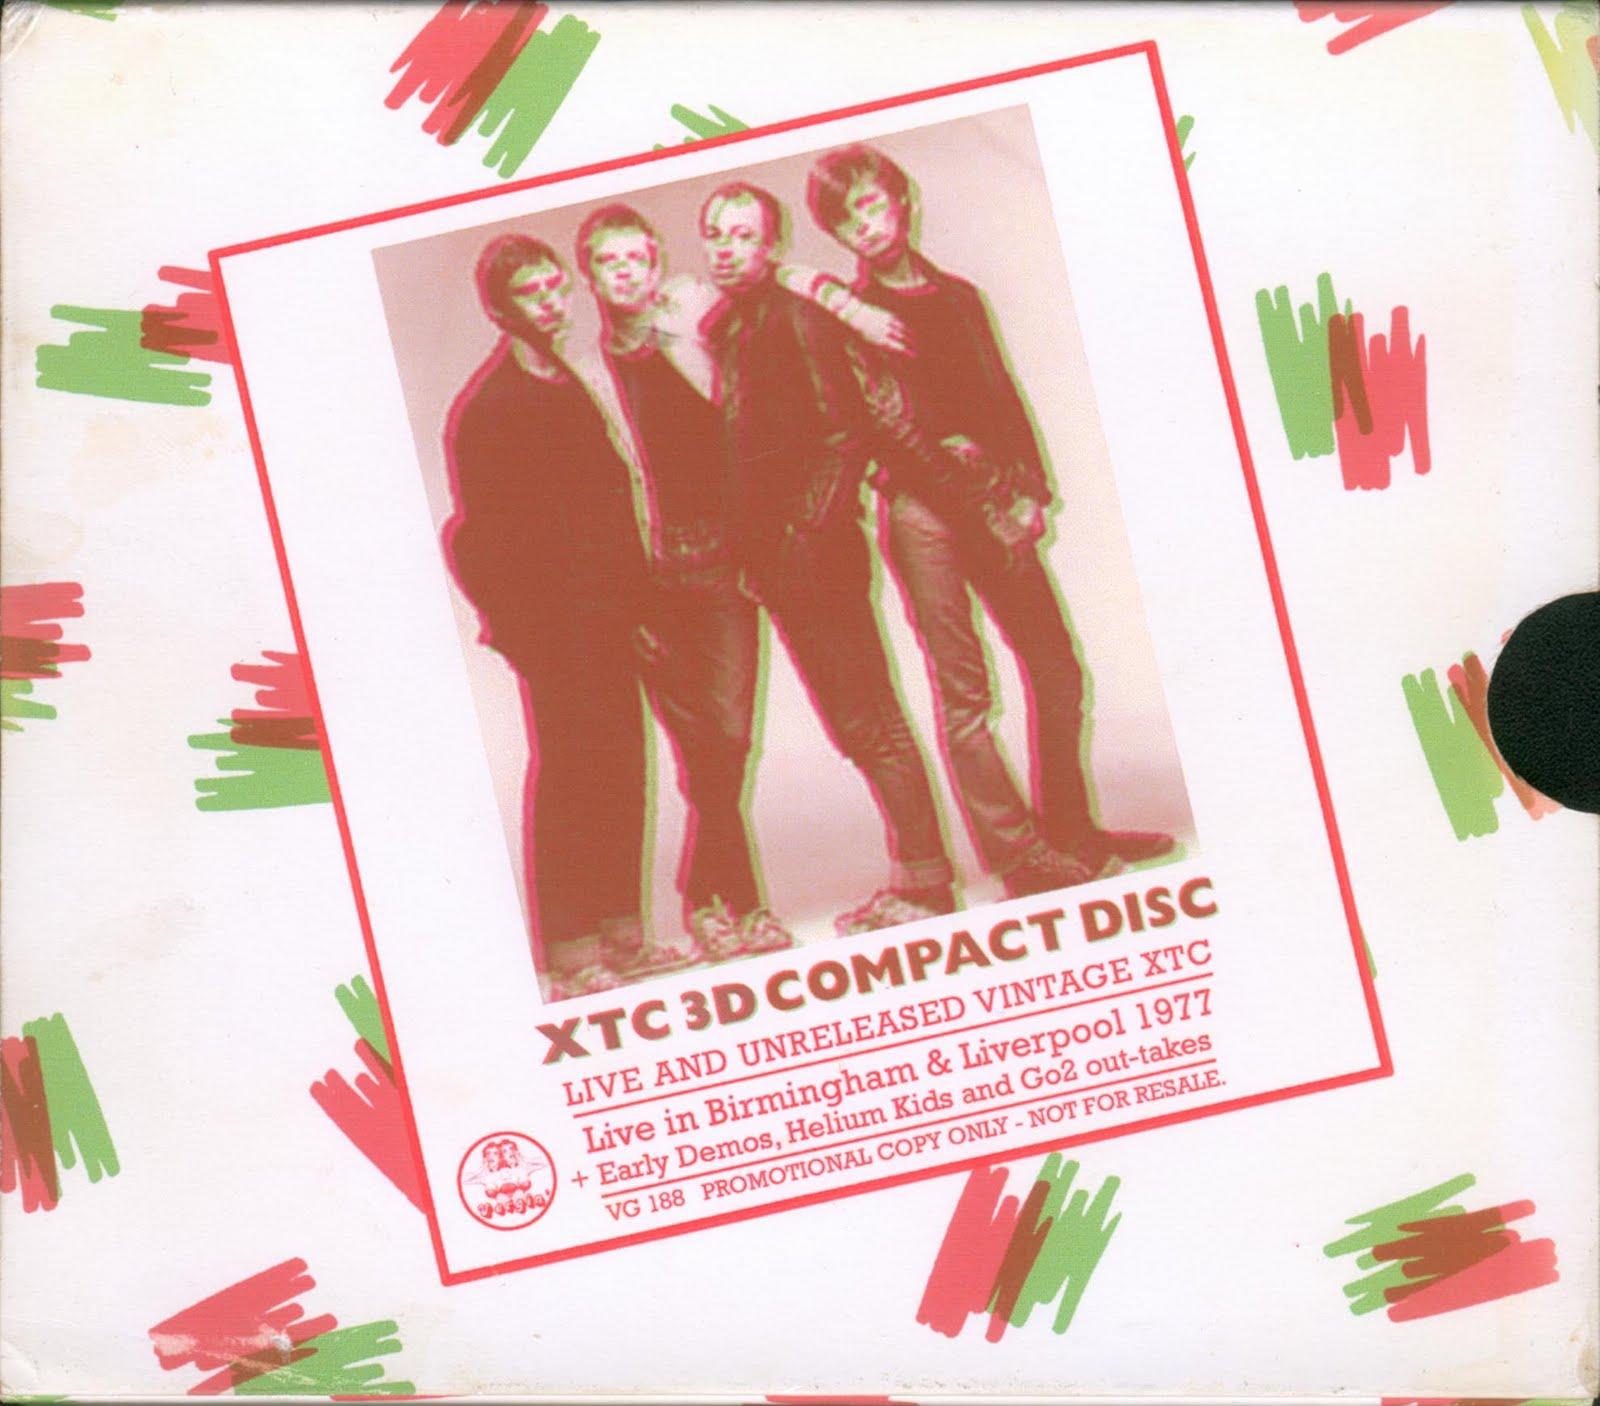 music ruined my life: XTC: 3D CD (1977)